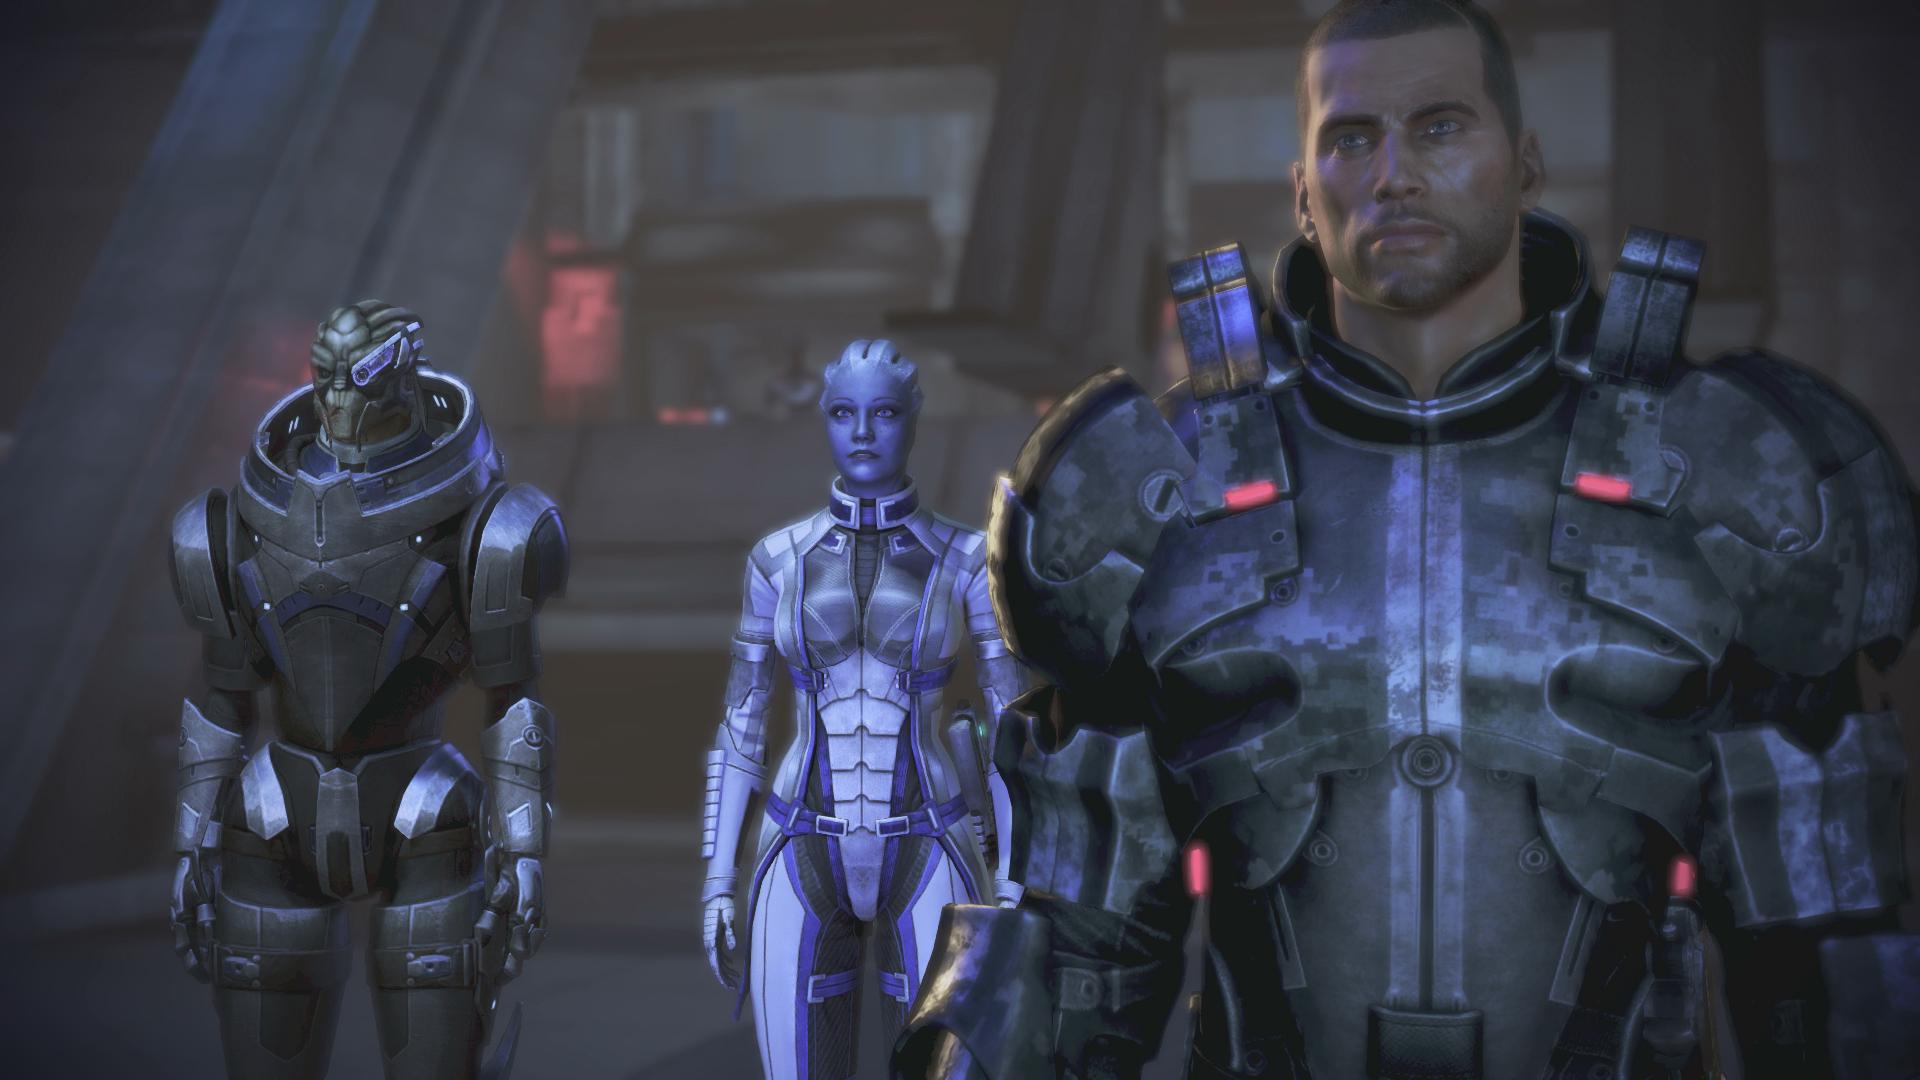 Modders are revitalising Mass Effect 3 for N7 Day | PC Gamer